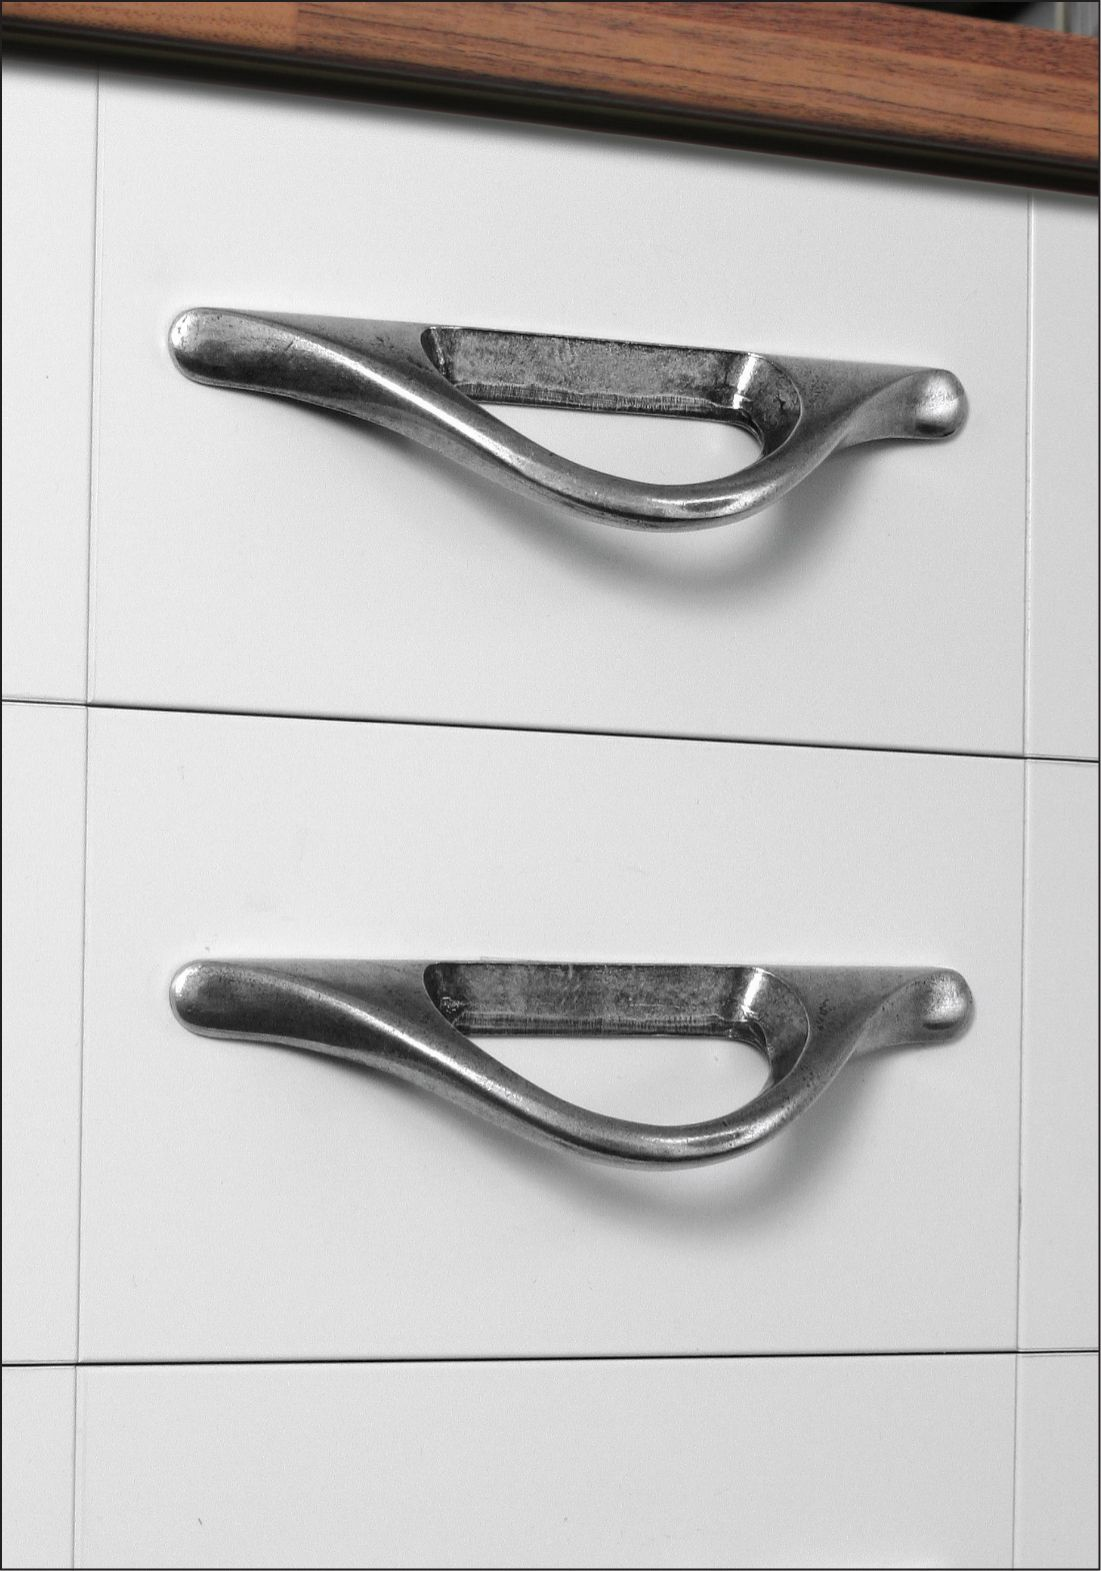 Distinctive Cabinet Hardware